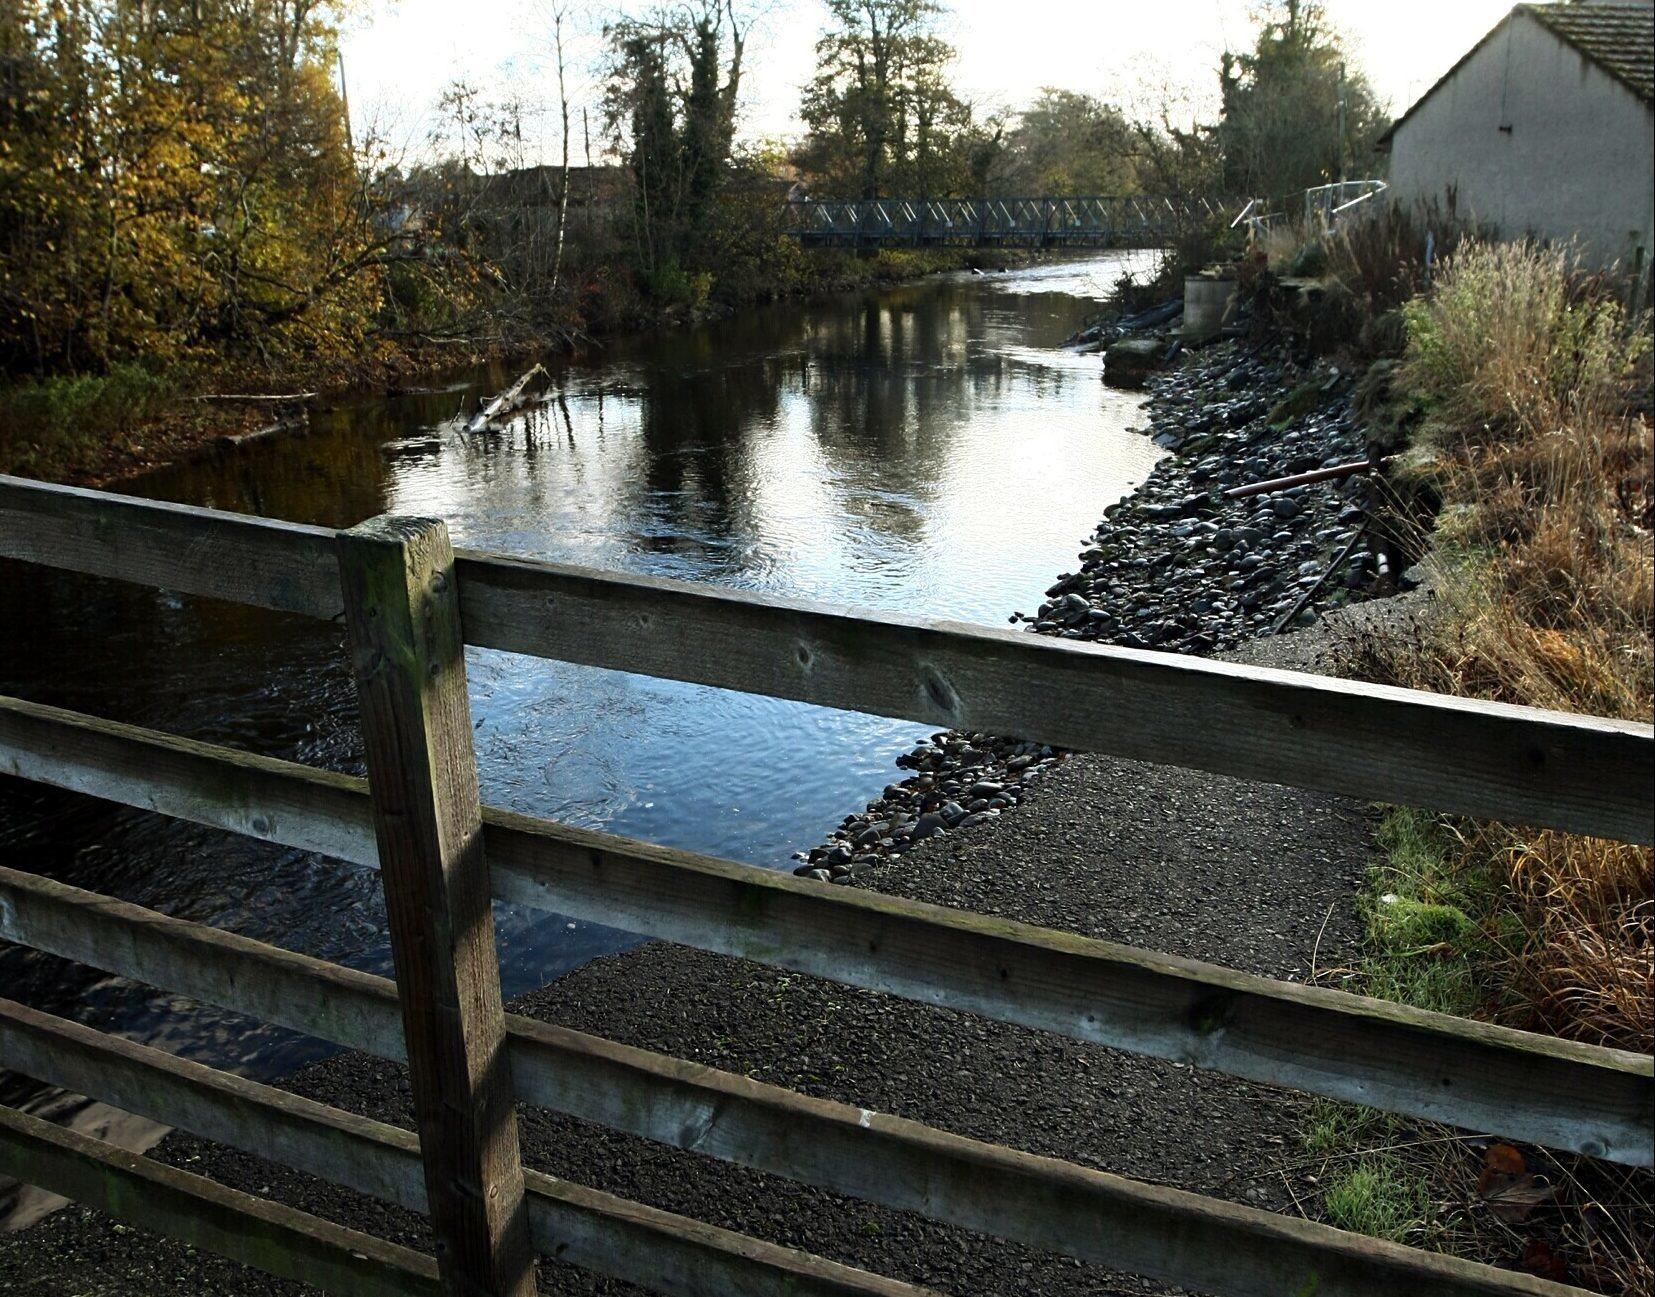 The River Almond at Almondbank.